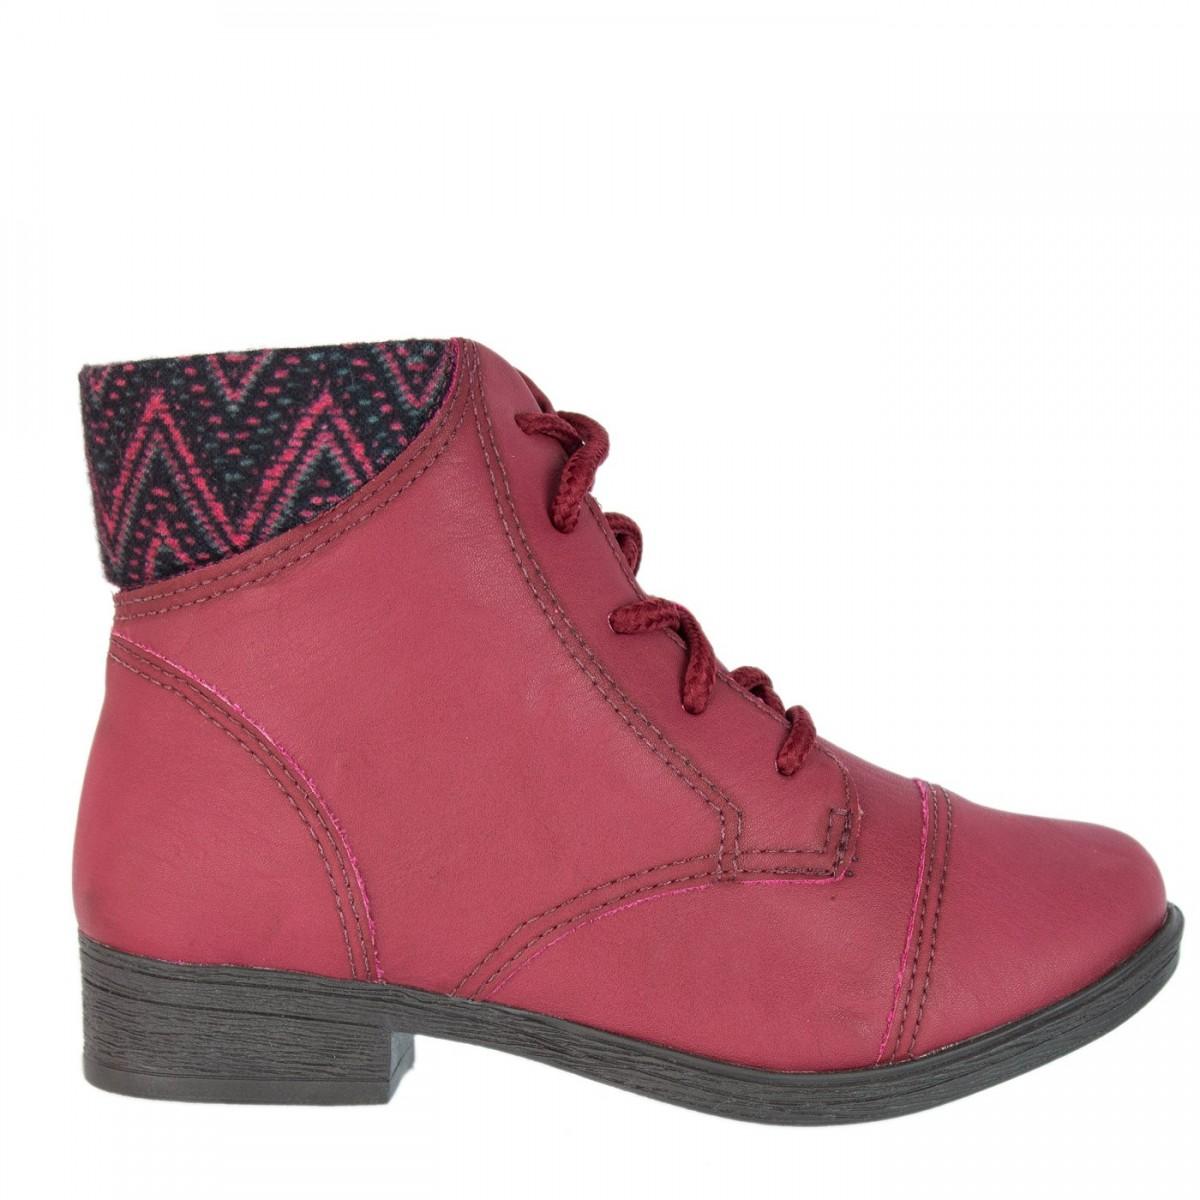 b1404f622 Bizz Store - Bota Coturno Infantil Feminino Pink Cats Czar Preto